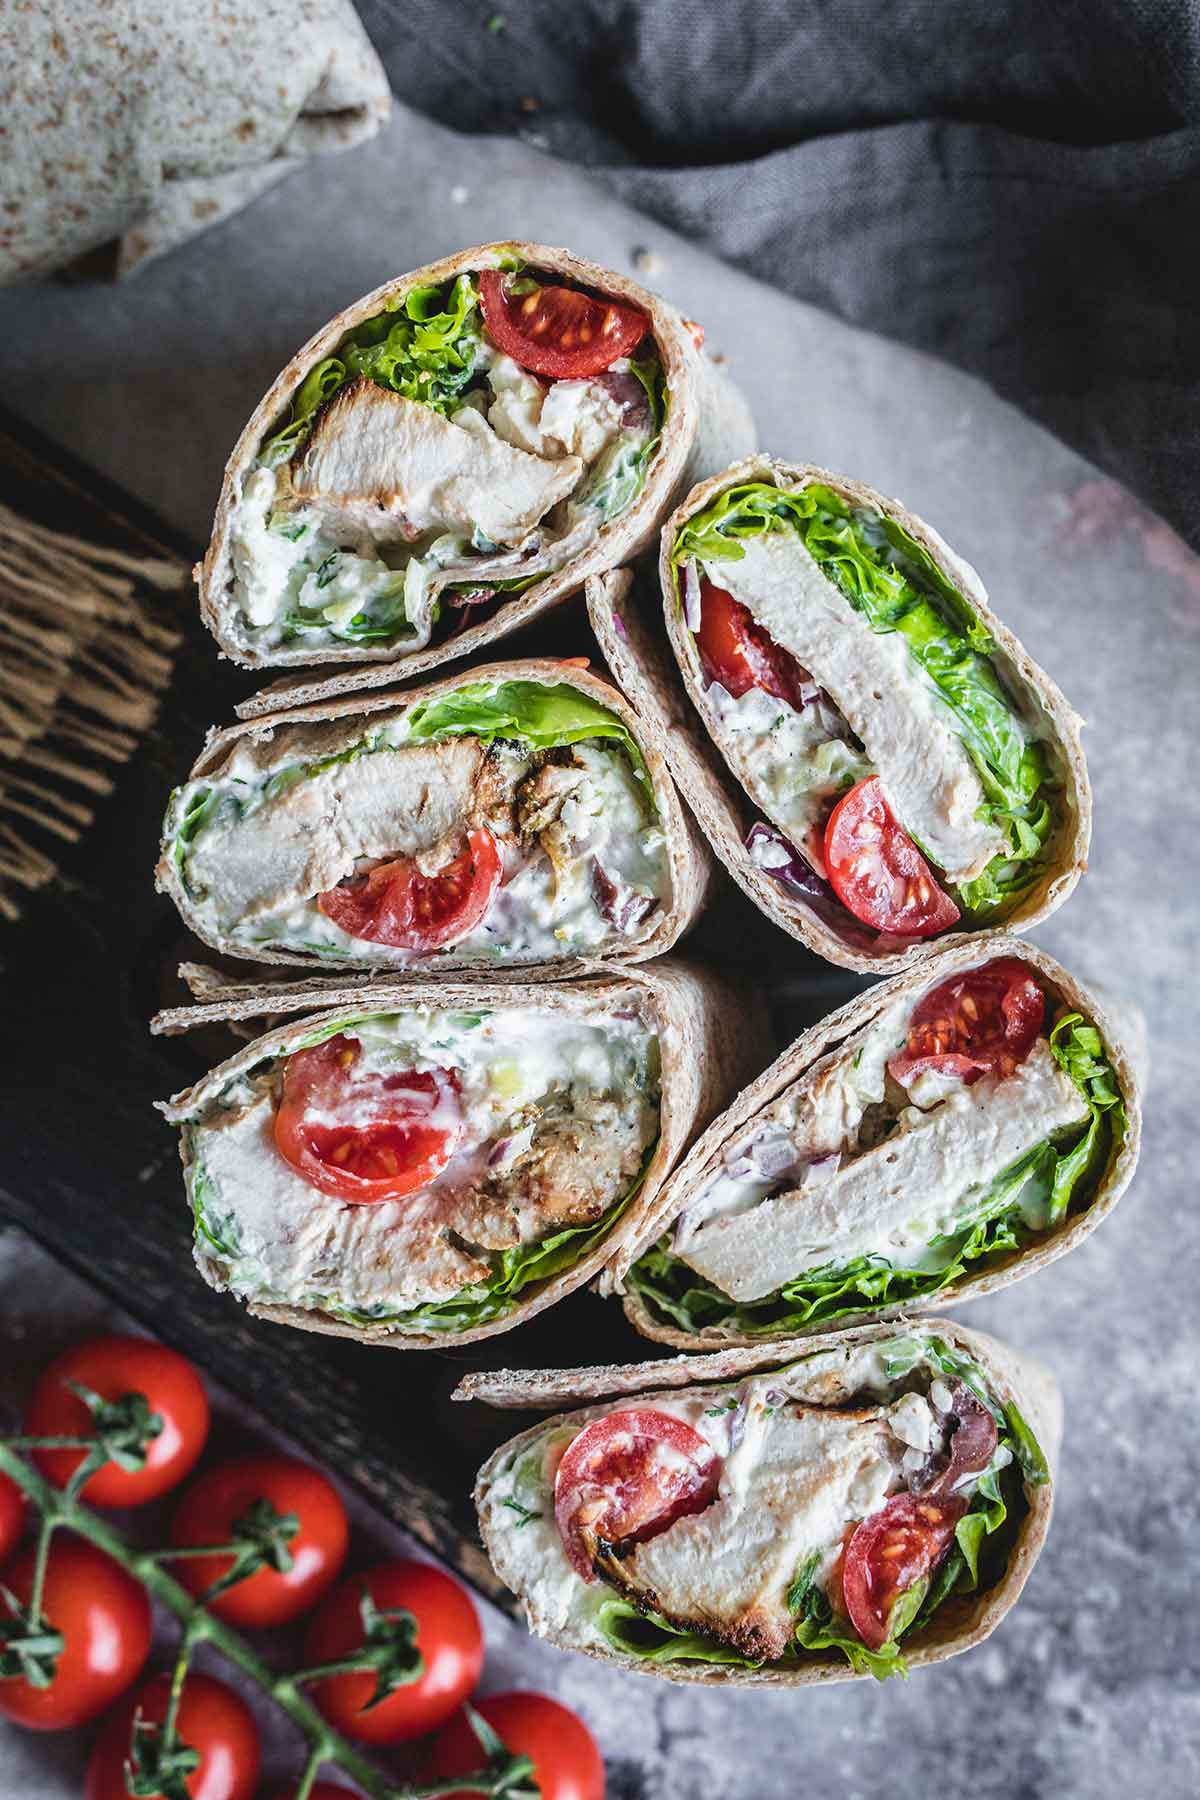 Healthy chicken wraps with homemade tzatziki sauce